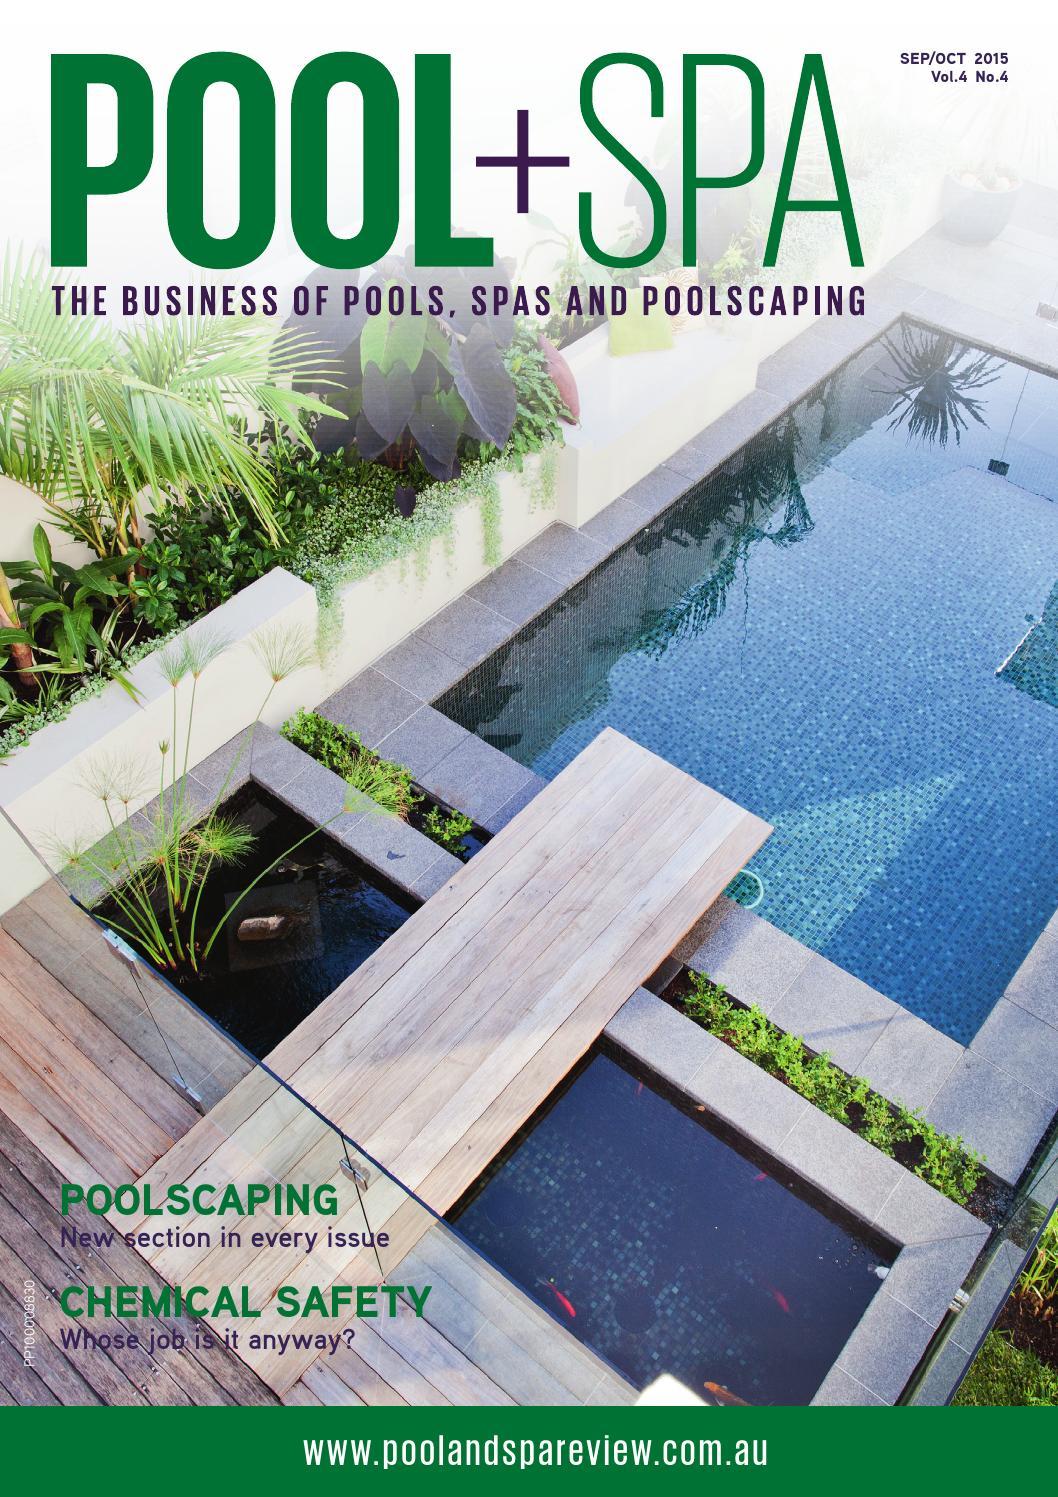 Pool spa sep oct 2015 by westwick farrow media issuu for Pool spa show 2015